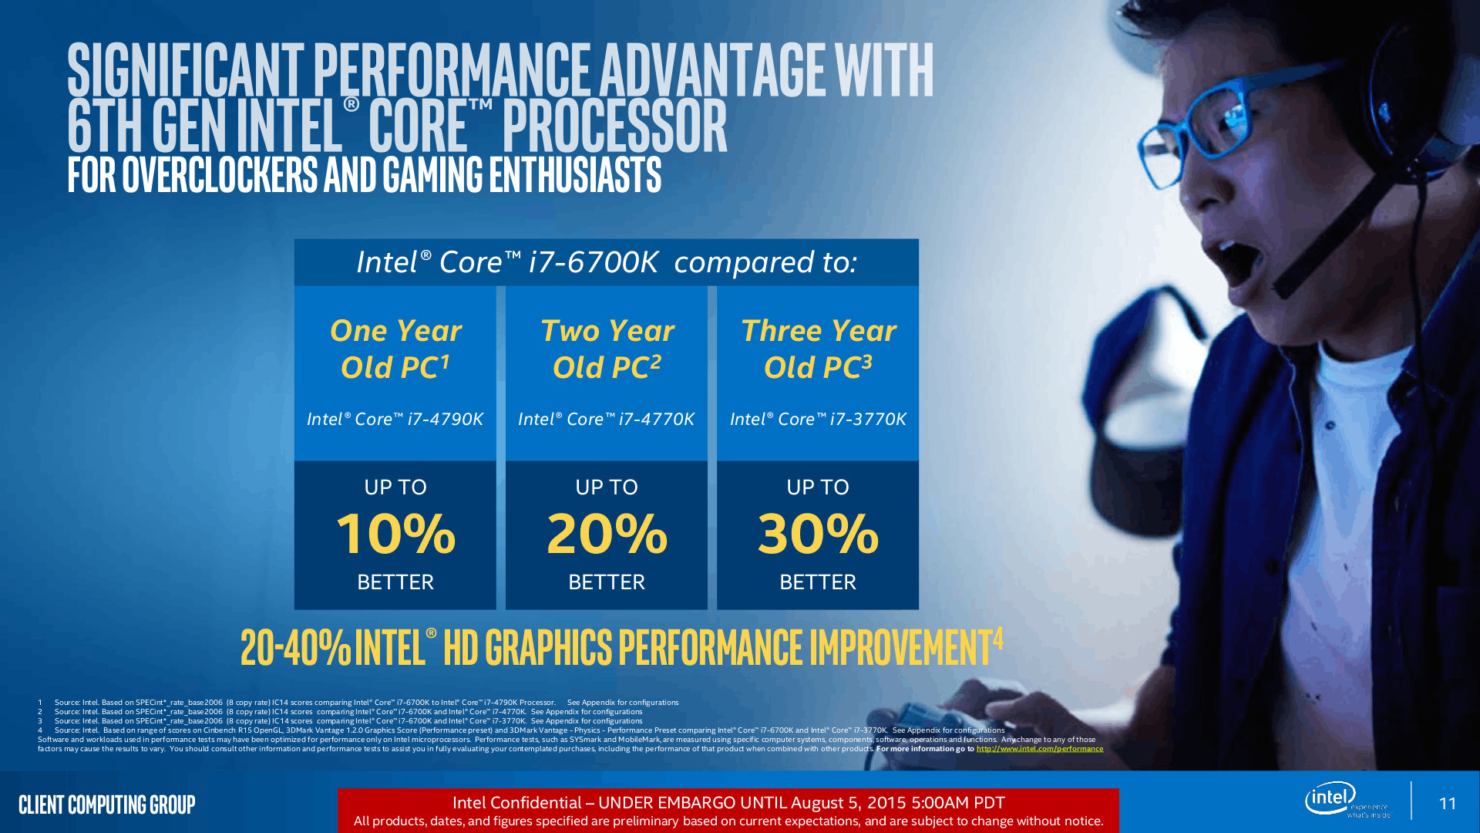 intel-skylake-k-performance-improvements